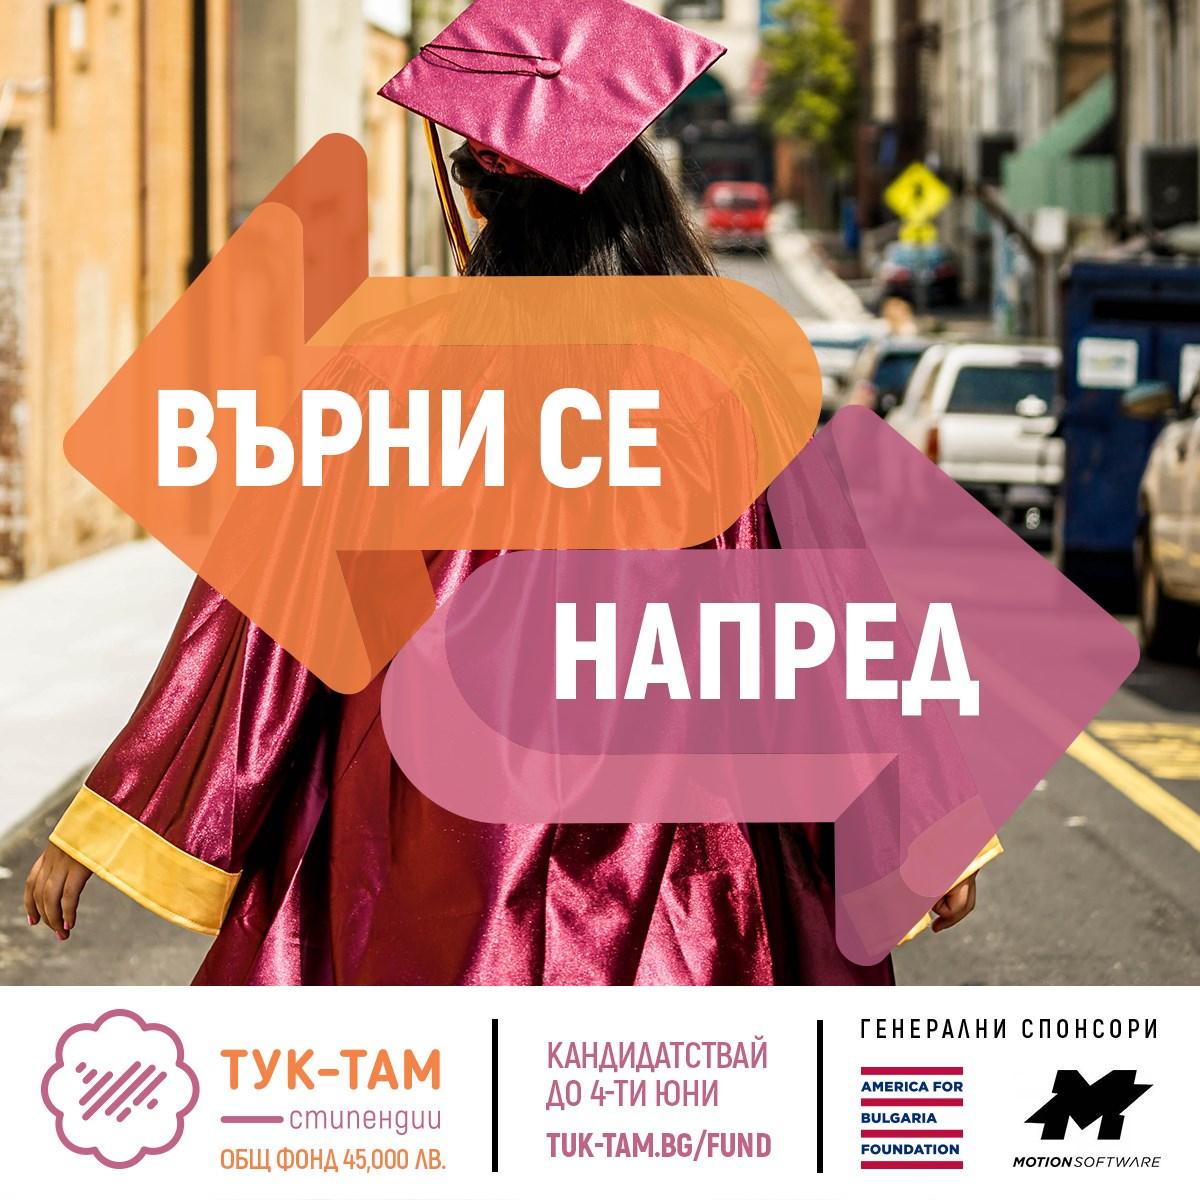 tuk-tam scholarship fund